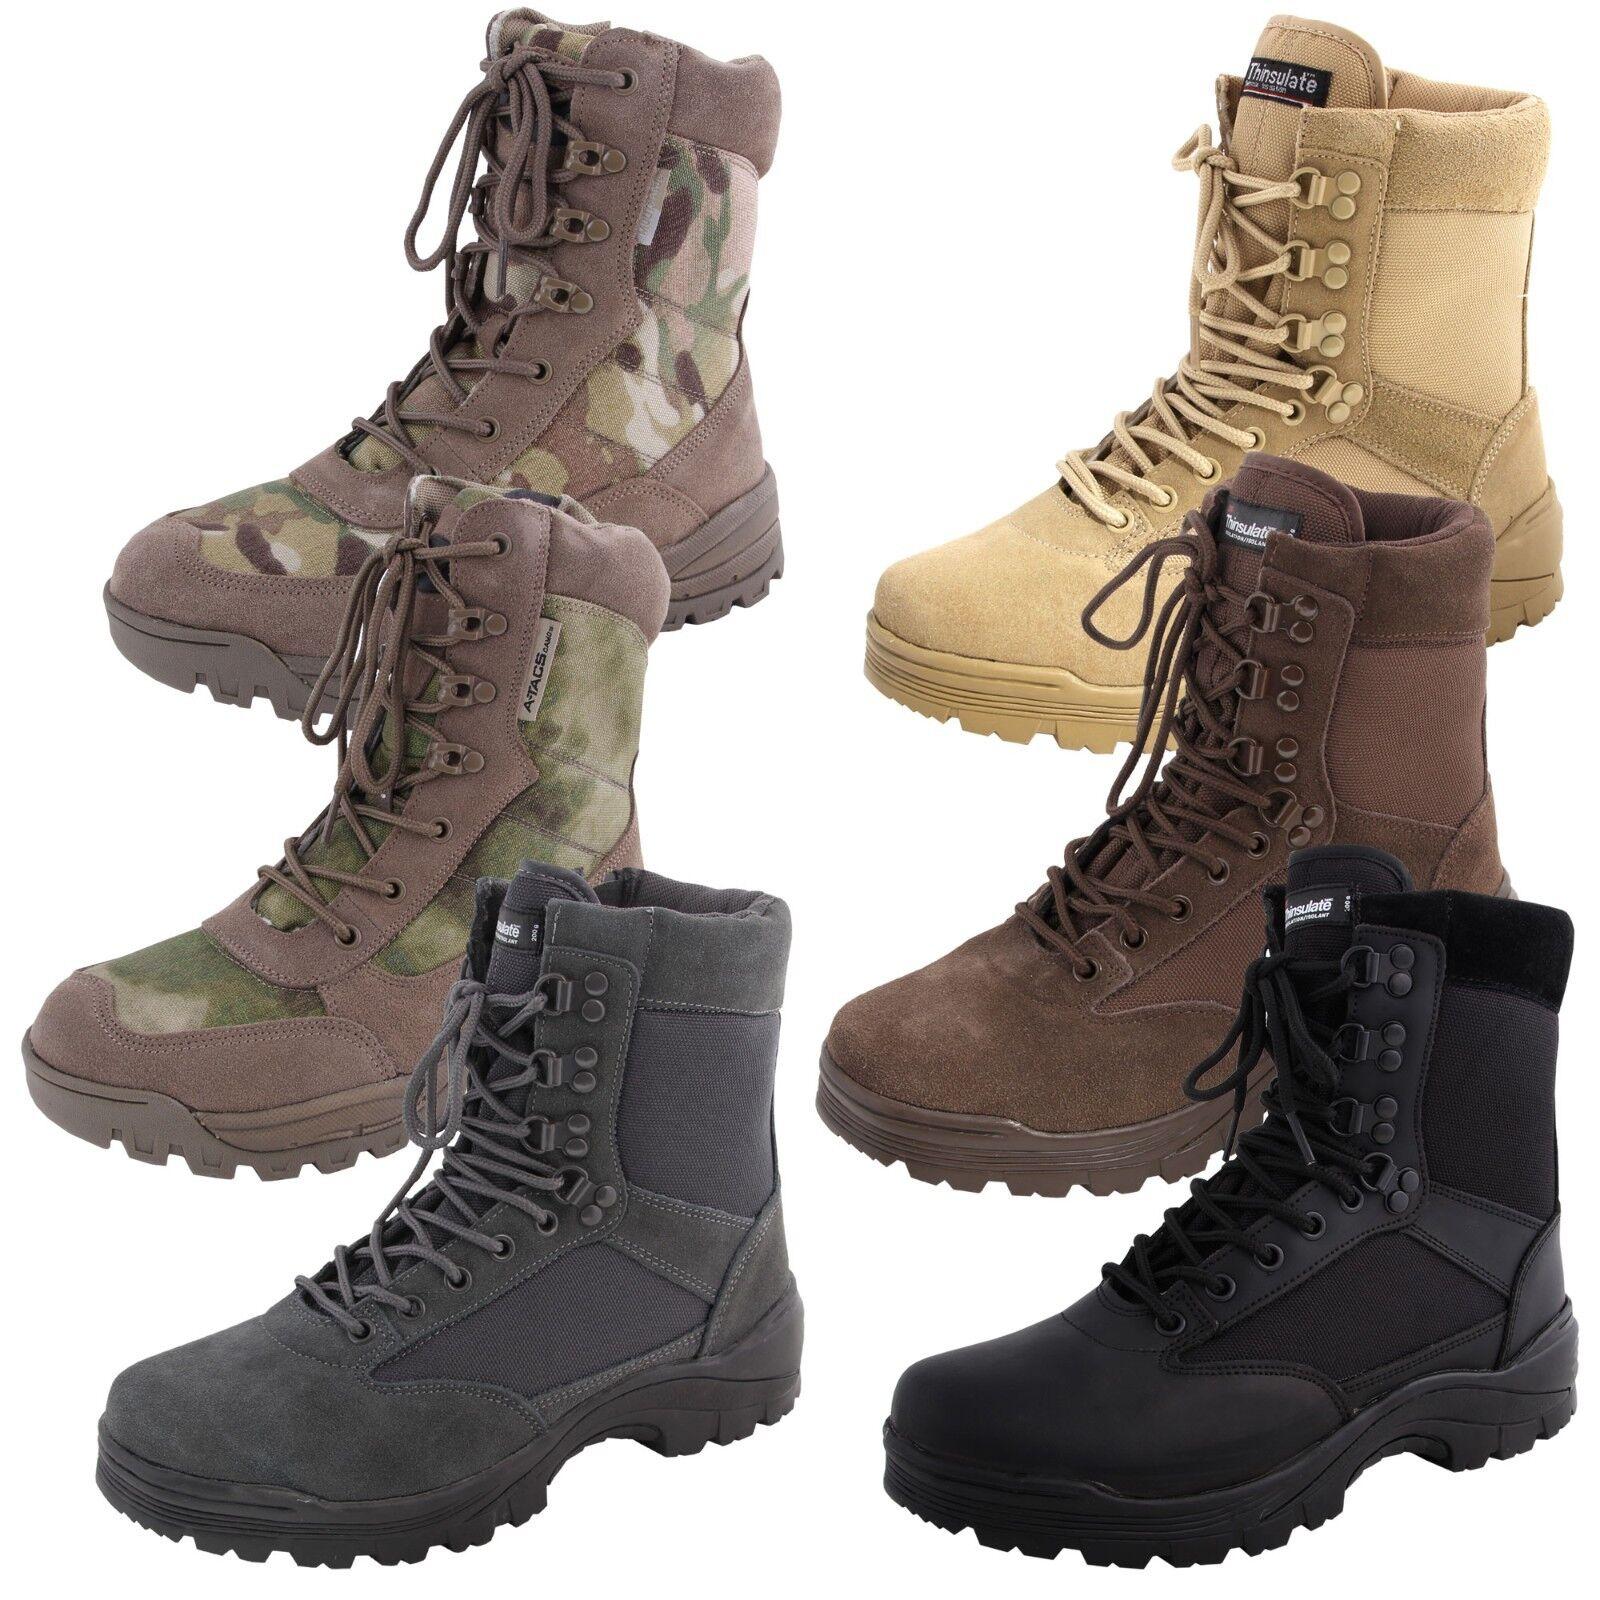 Grandes descuentos nuevos zapatos Etnies Jameson mt Navy skater Sneaker/zapatos azul